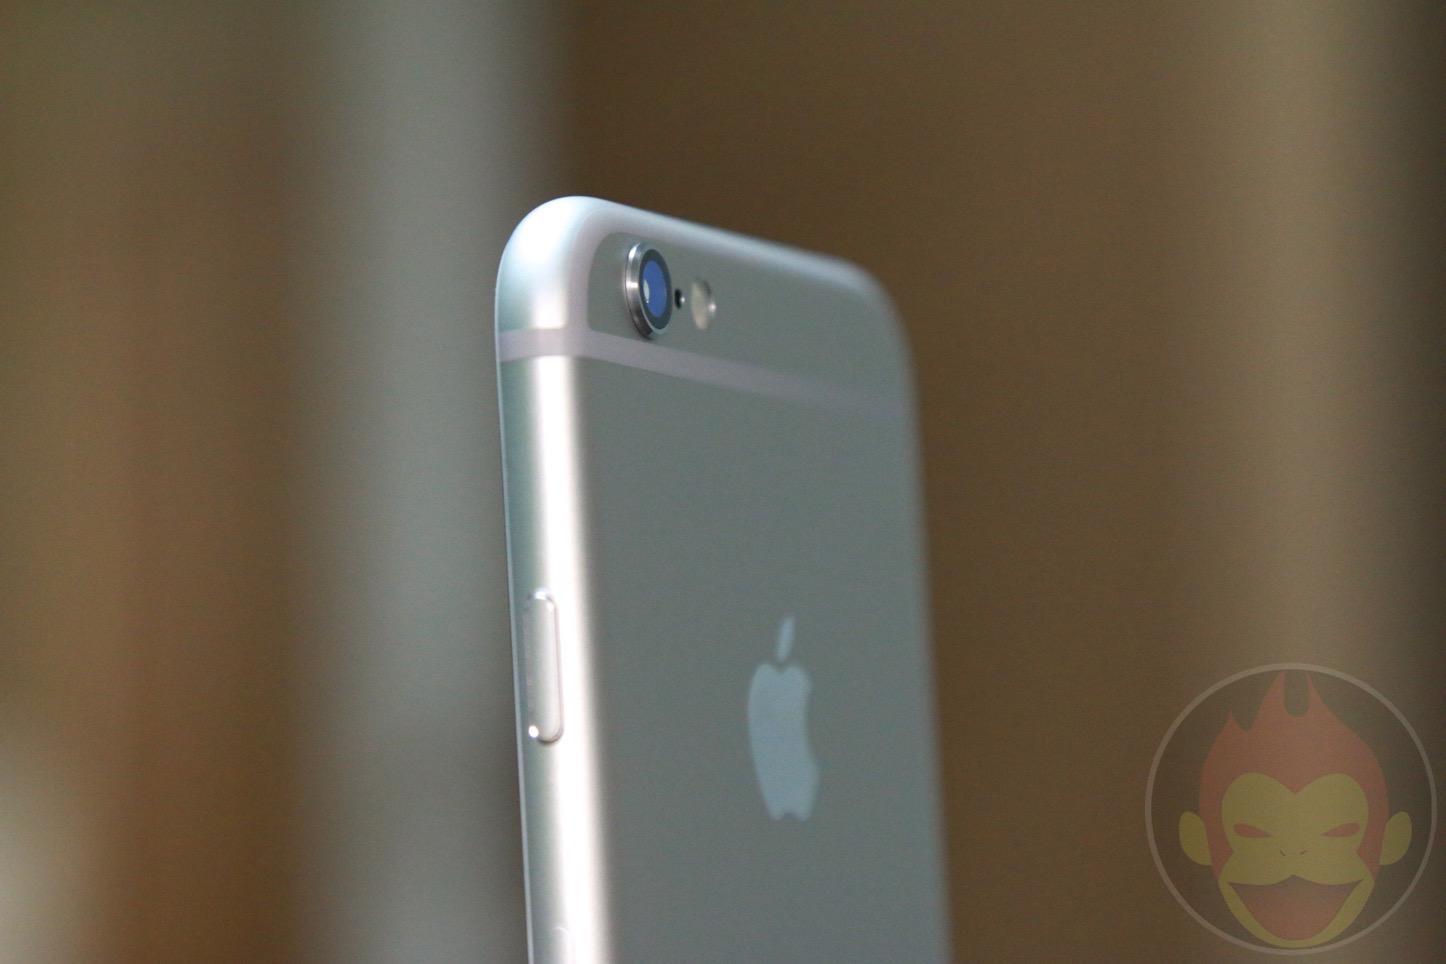 IPhone 6s Flash